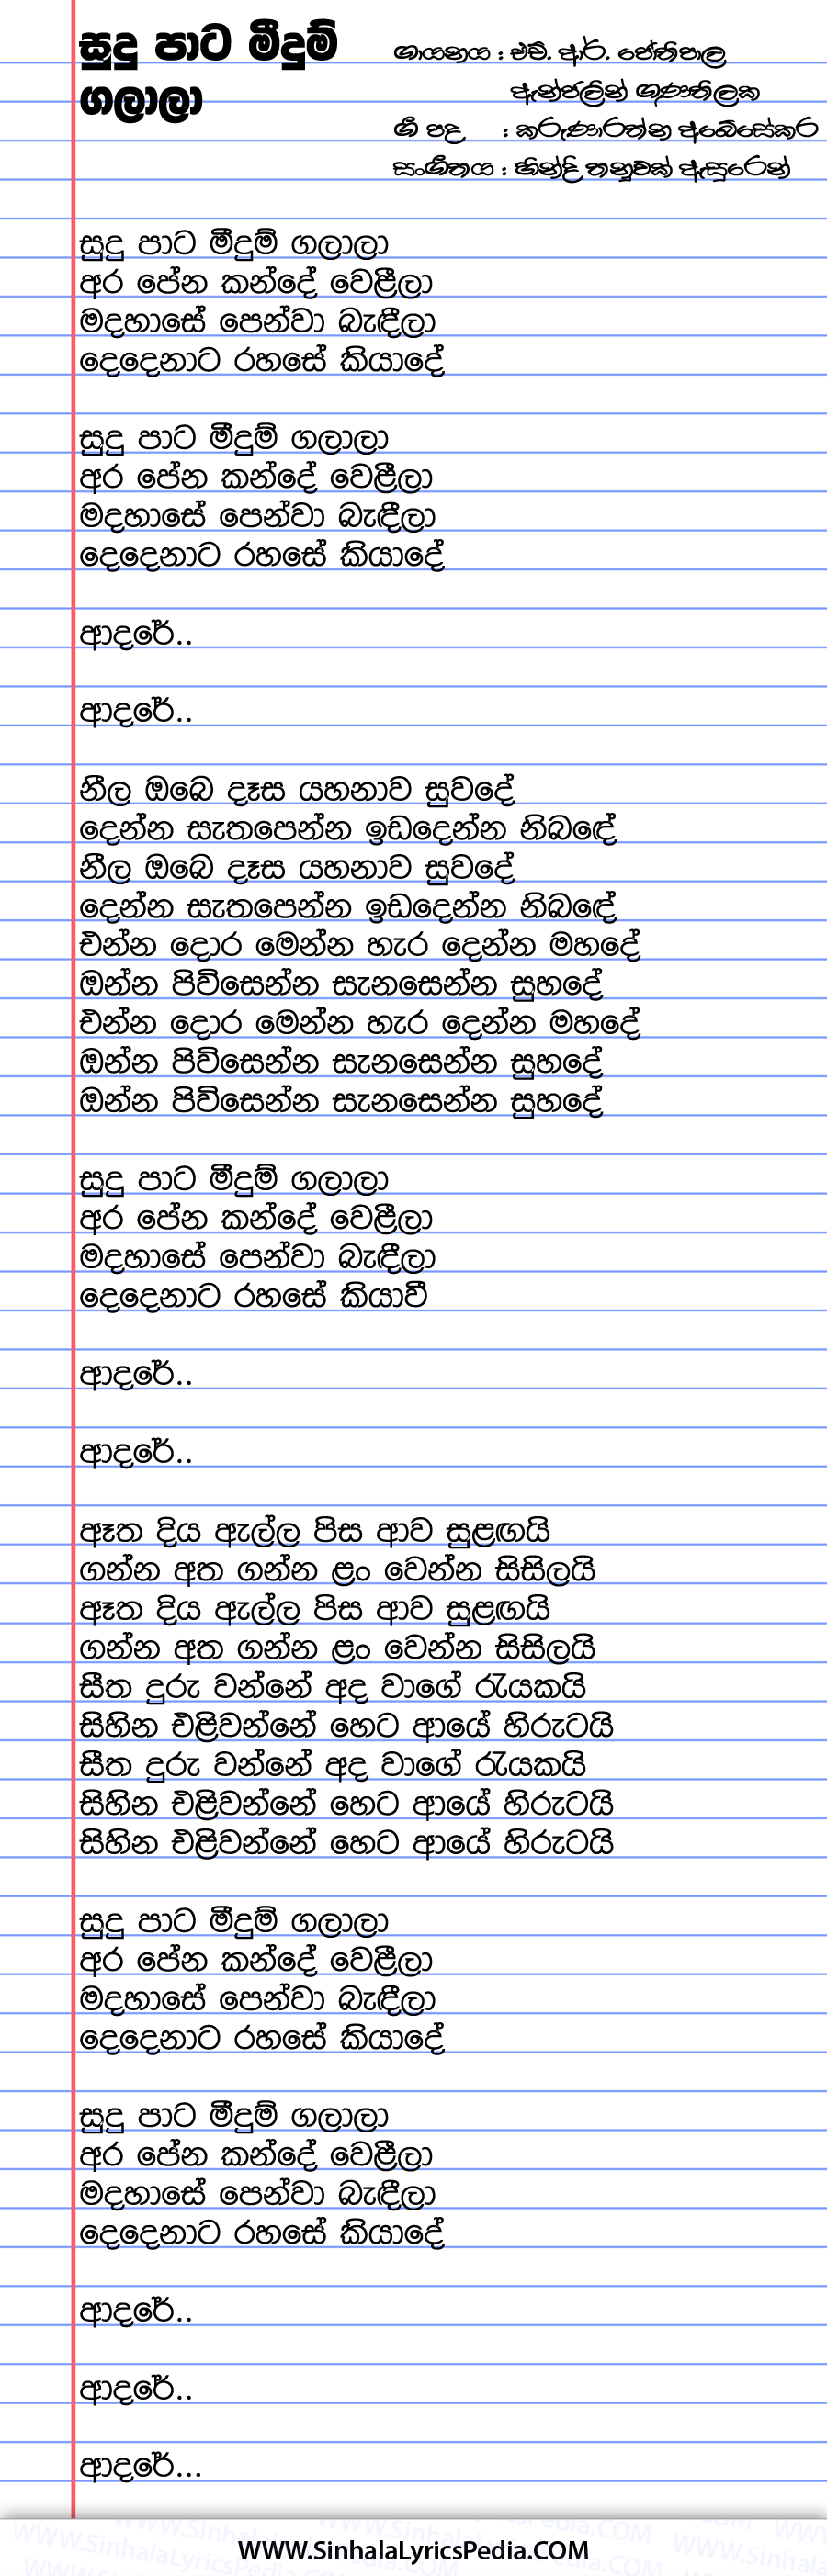 Sudu Pata Meedum Galala Song Lyrics